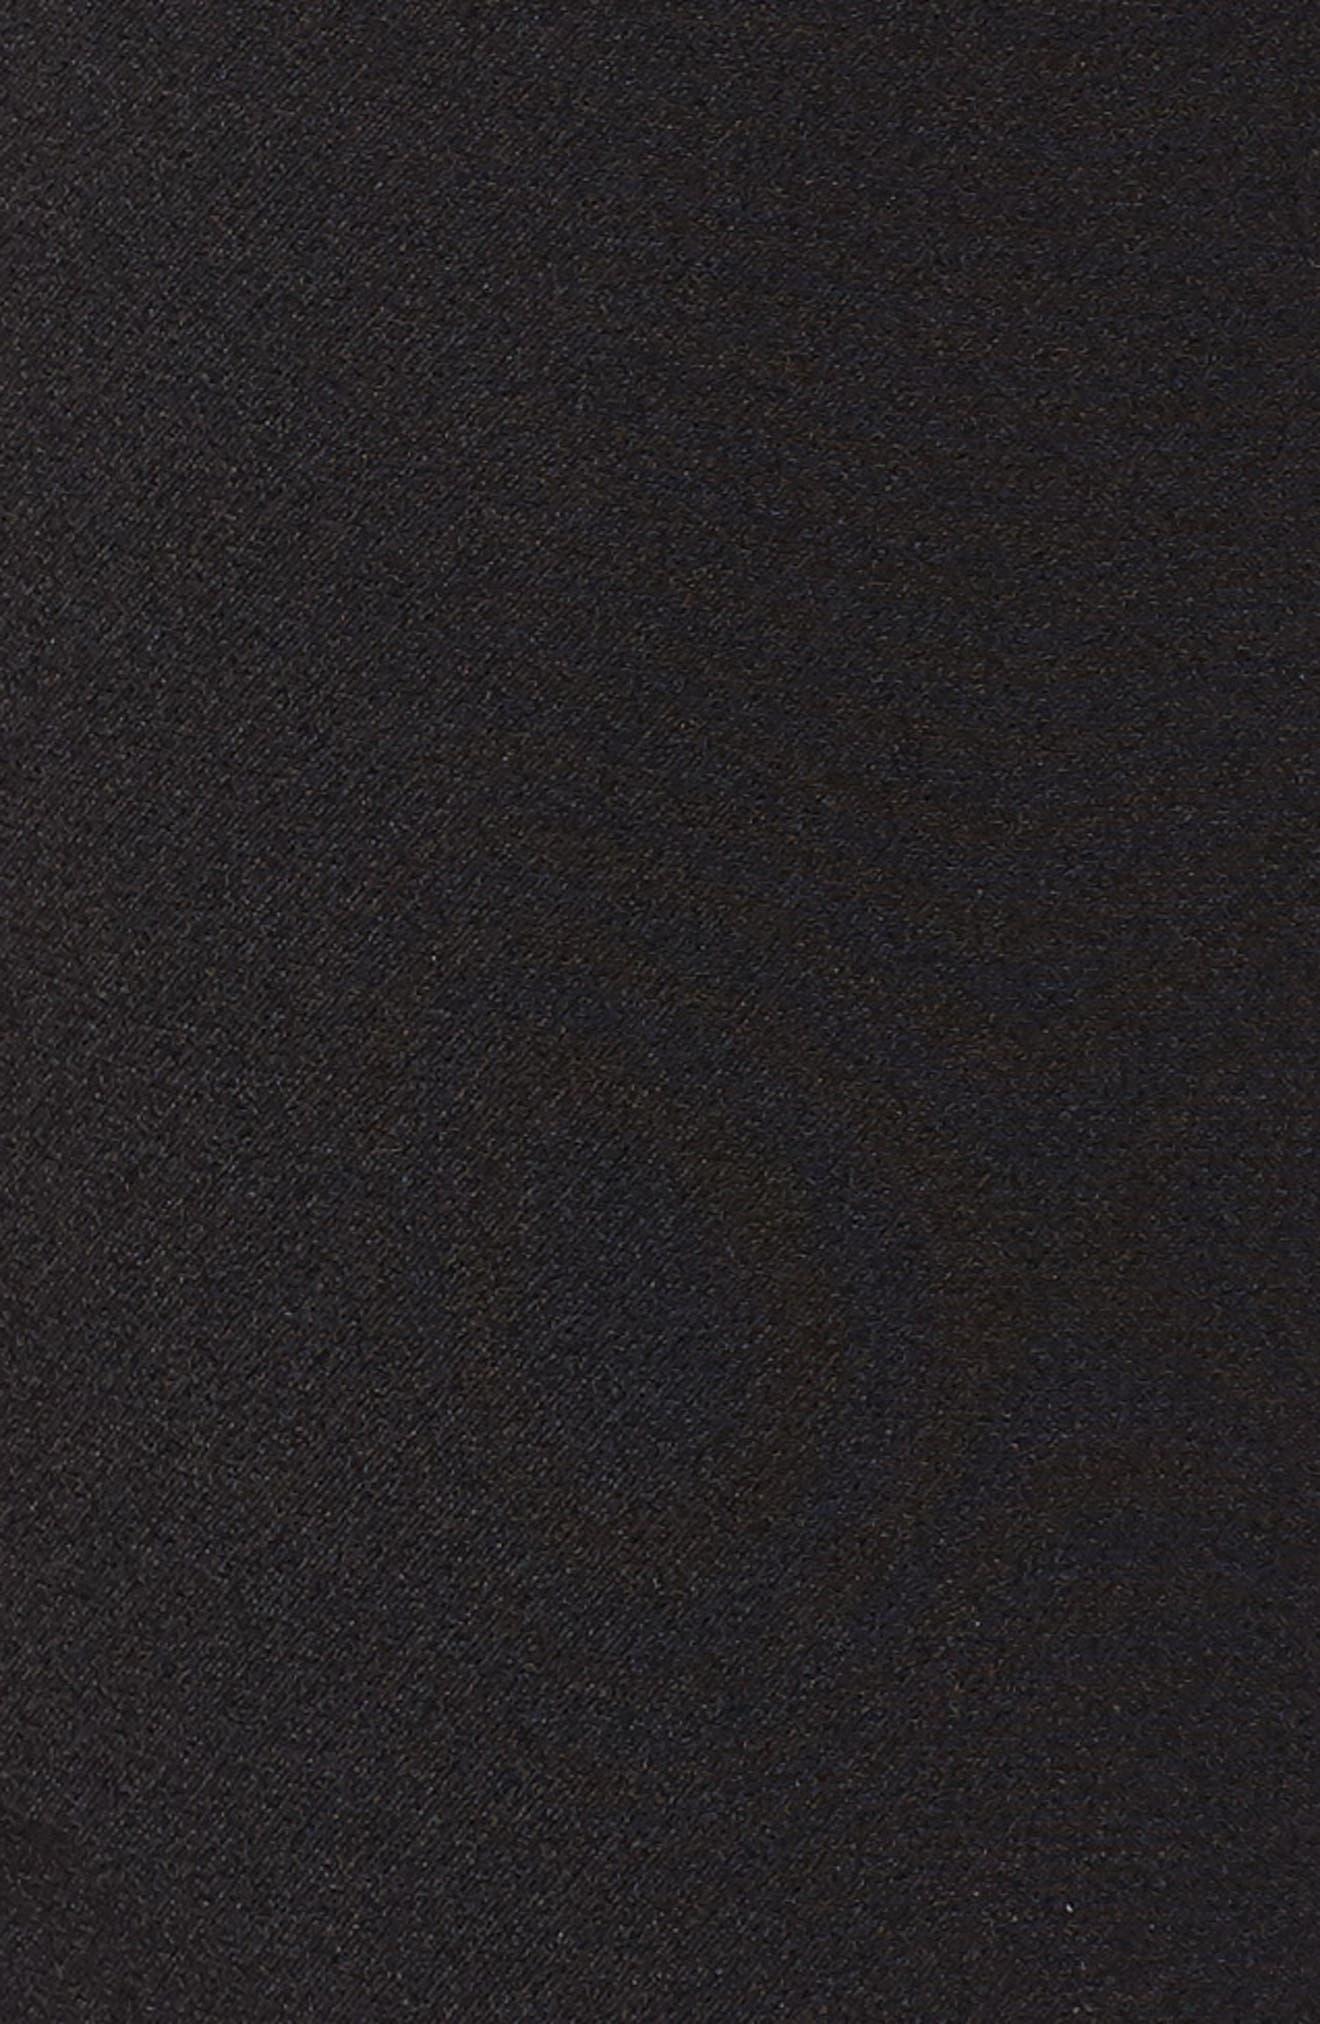 Maron Straight Leg Seamed Pants,                             Alternate thumbnail 6, color,                             Black